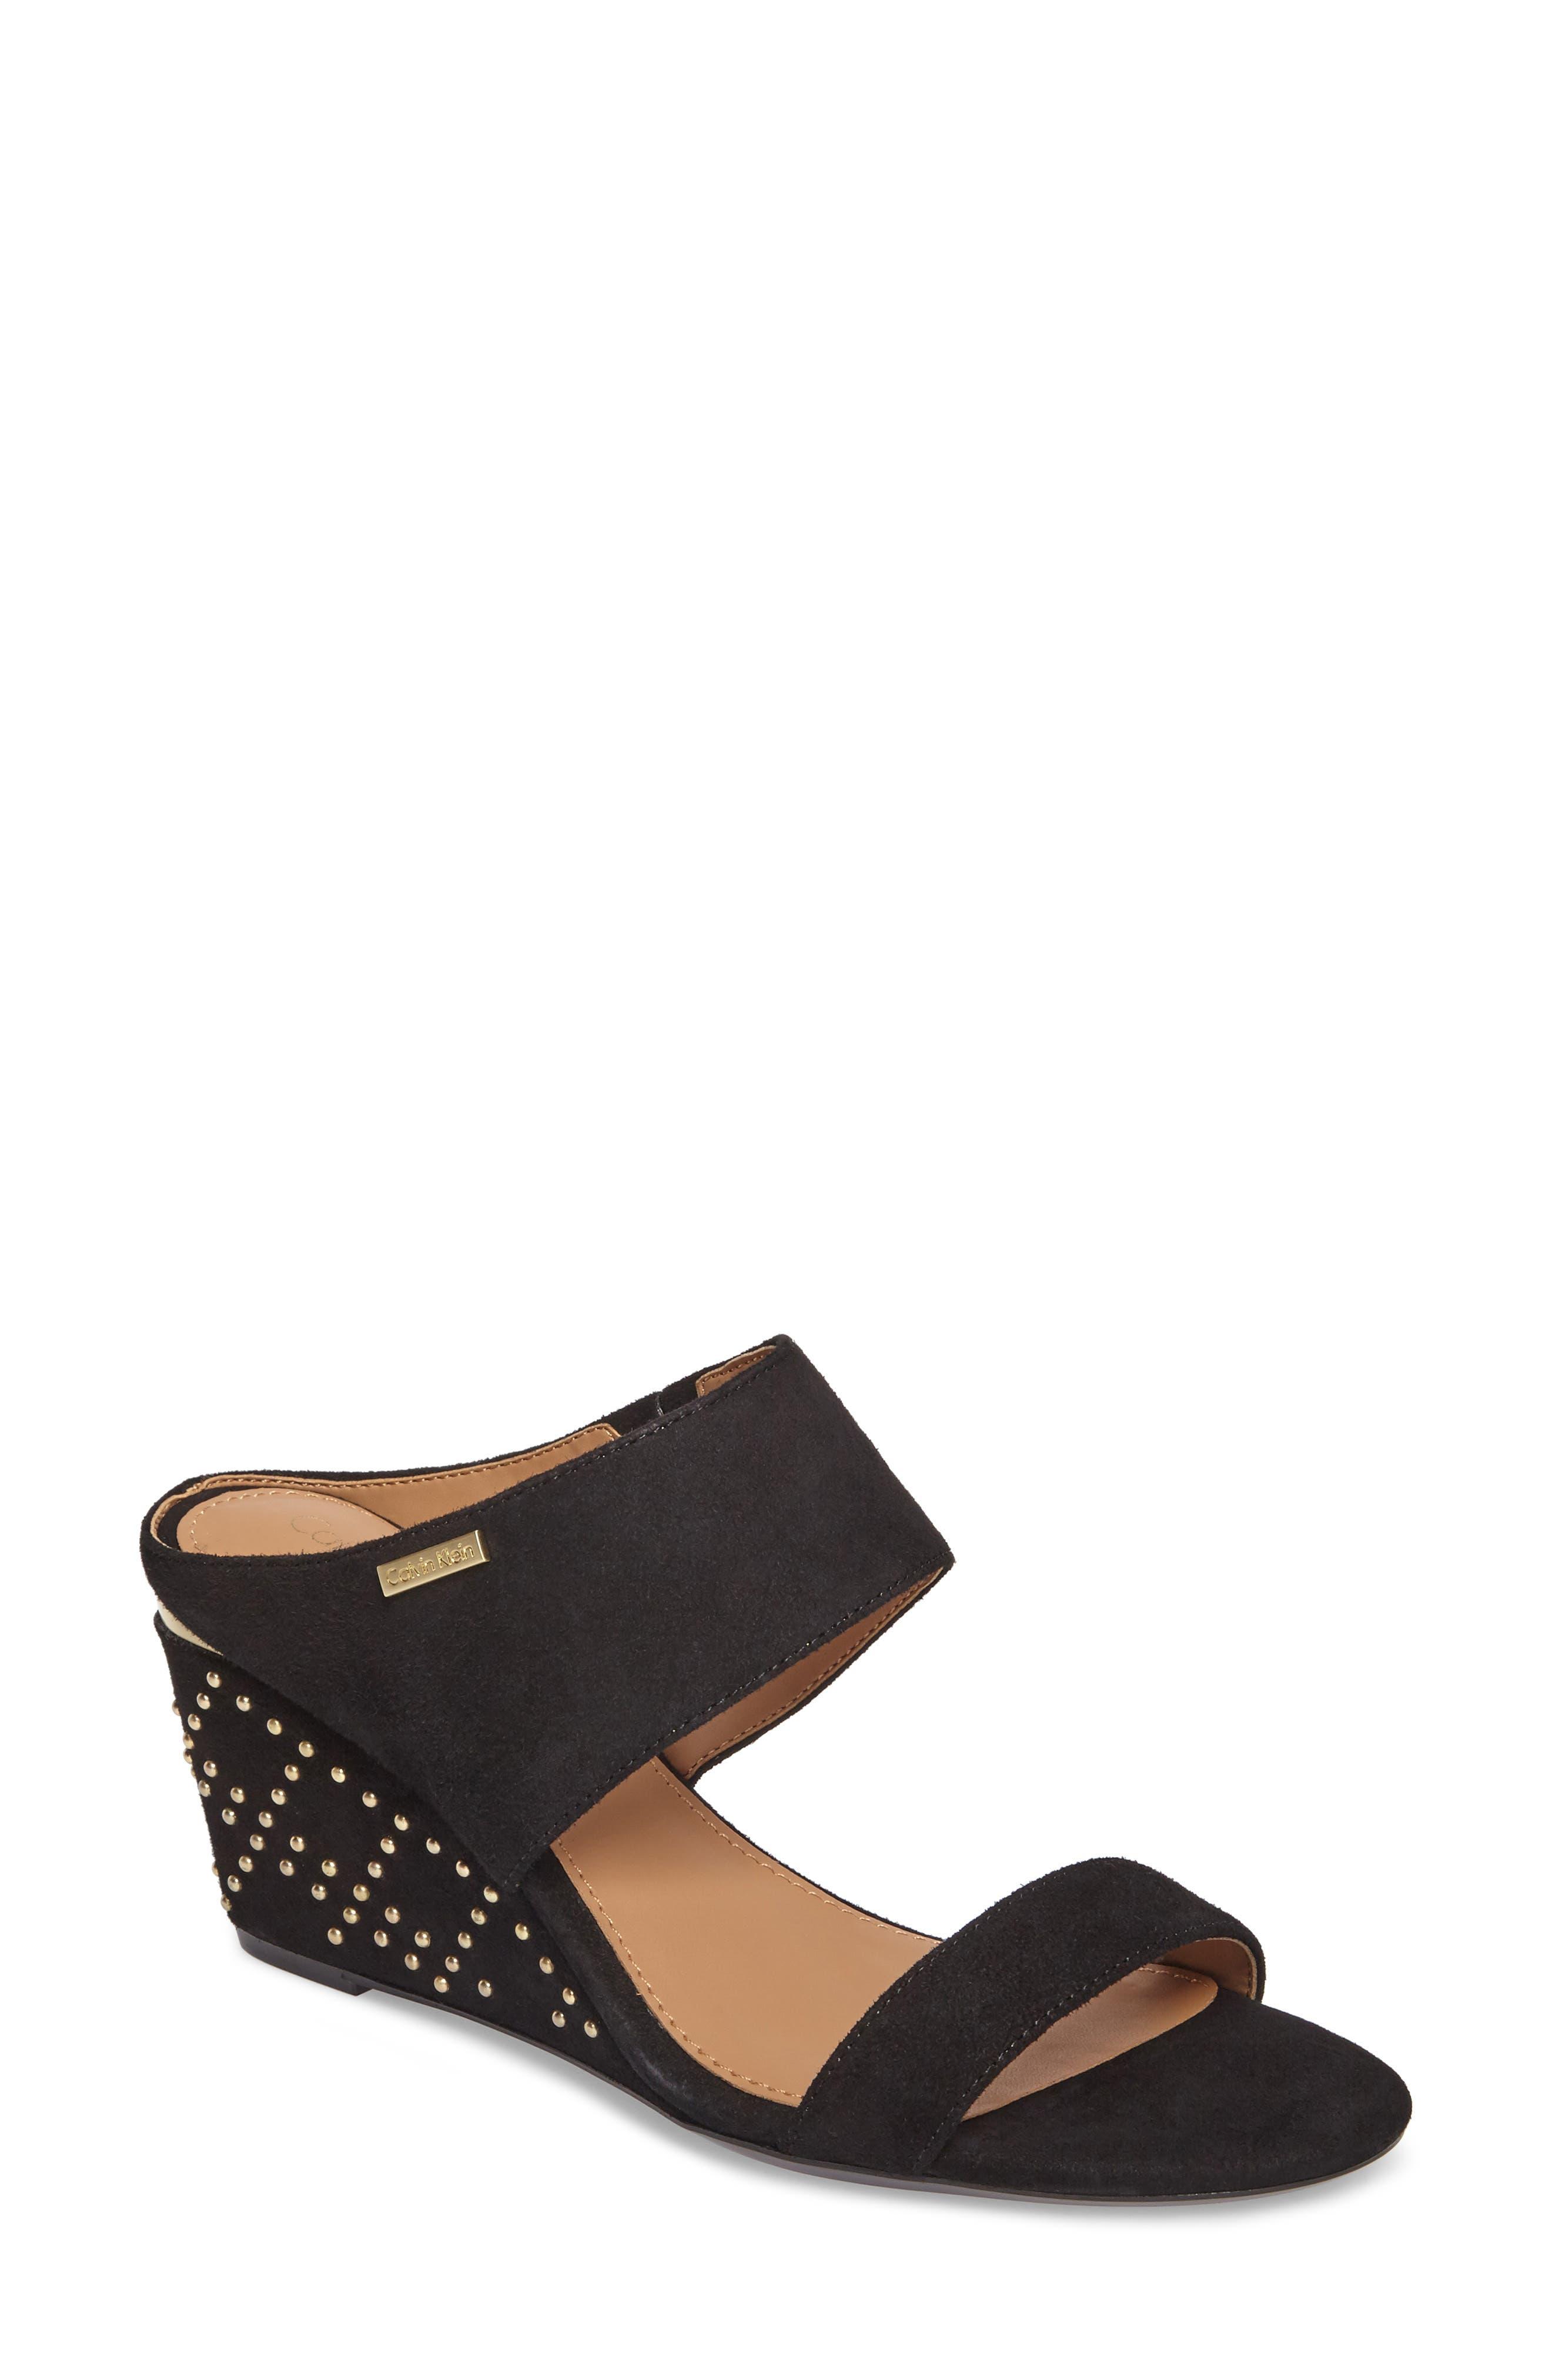 Phyllis Studded Wedge Sandal,                         Main,                         color,